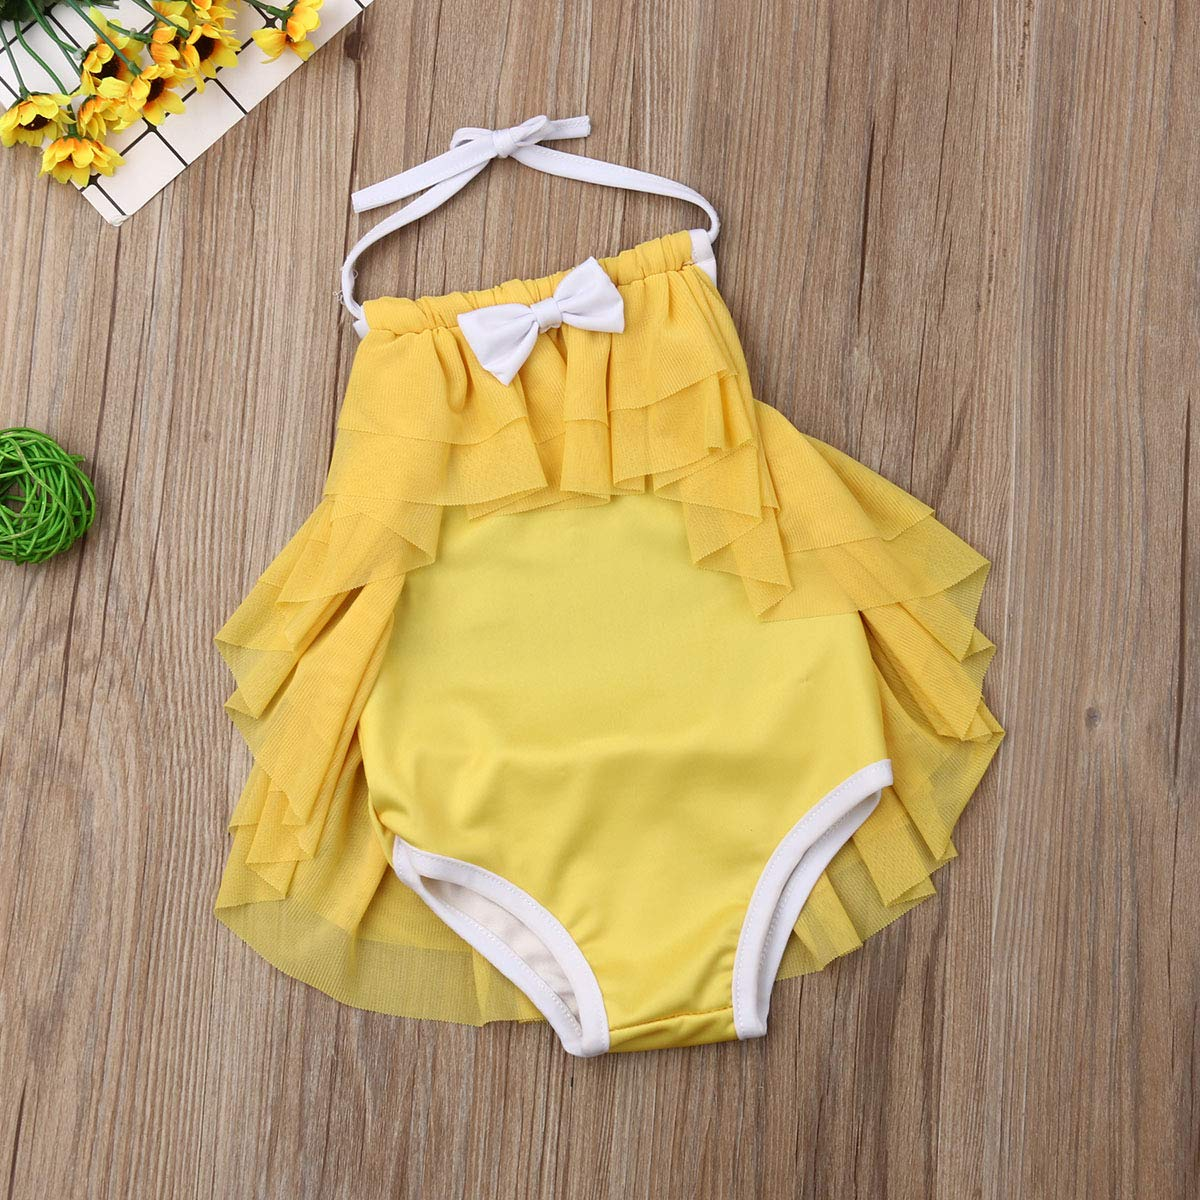 Toddler Kids Baby Girls Halter Backless Swimsuit Ruffle Mesh Bikini Bathing Suit